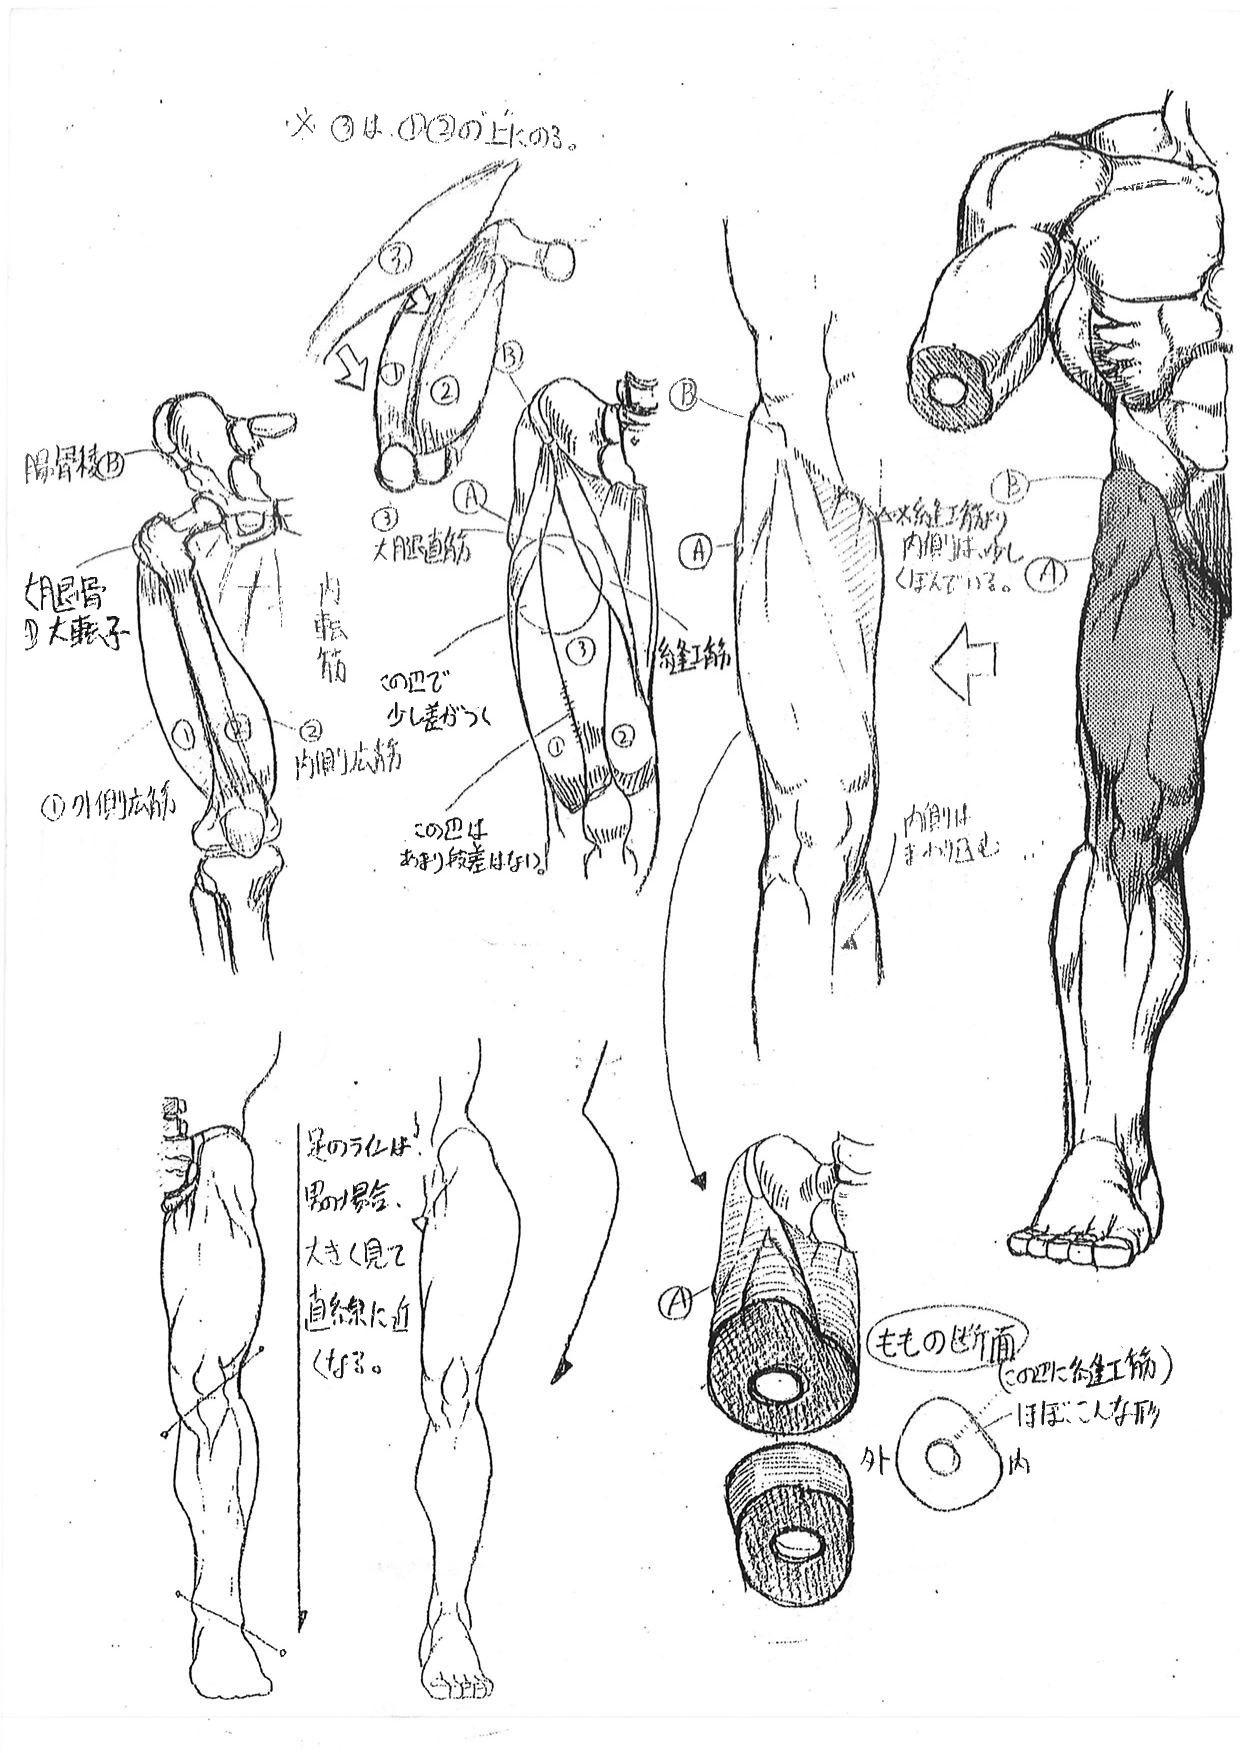 Pin by Cartoon_LOH on BODY TYPES | Pinterest | Anatomy and Anatomy ...